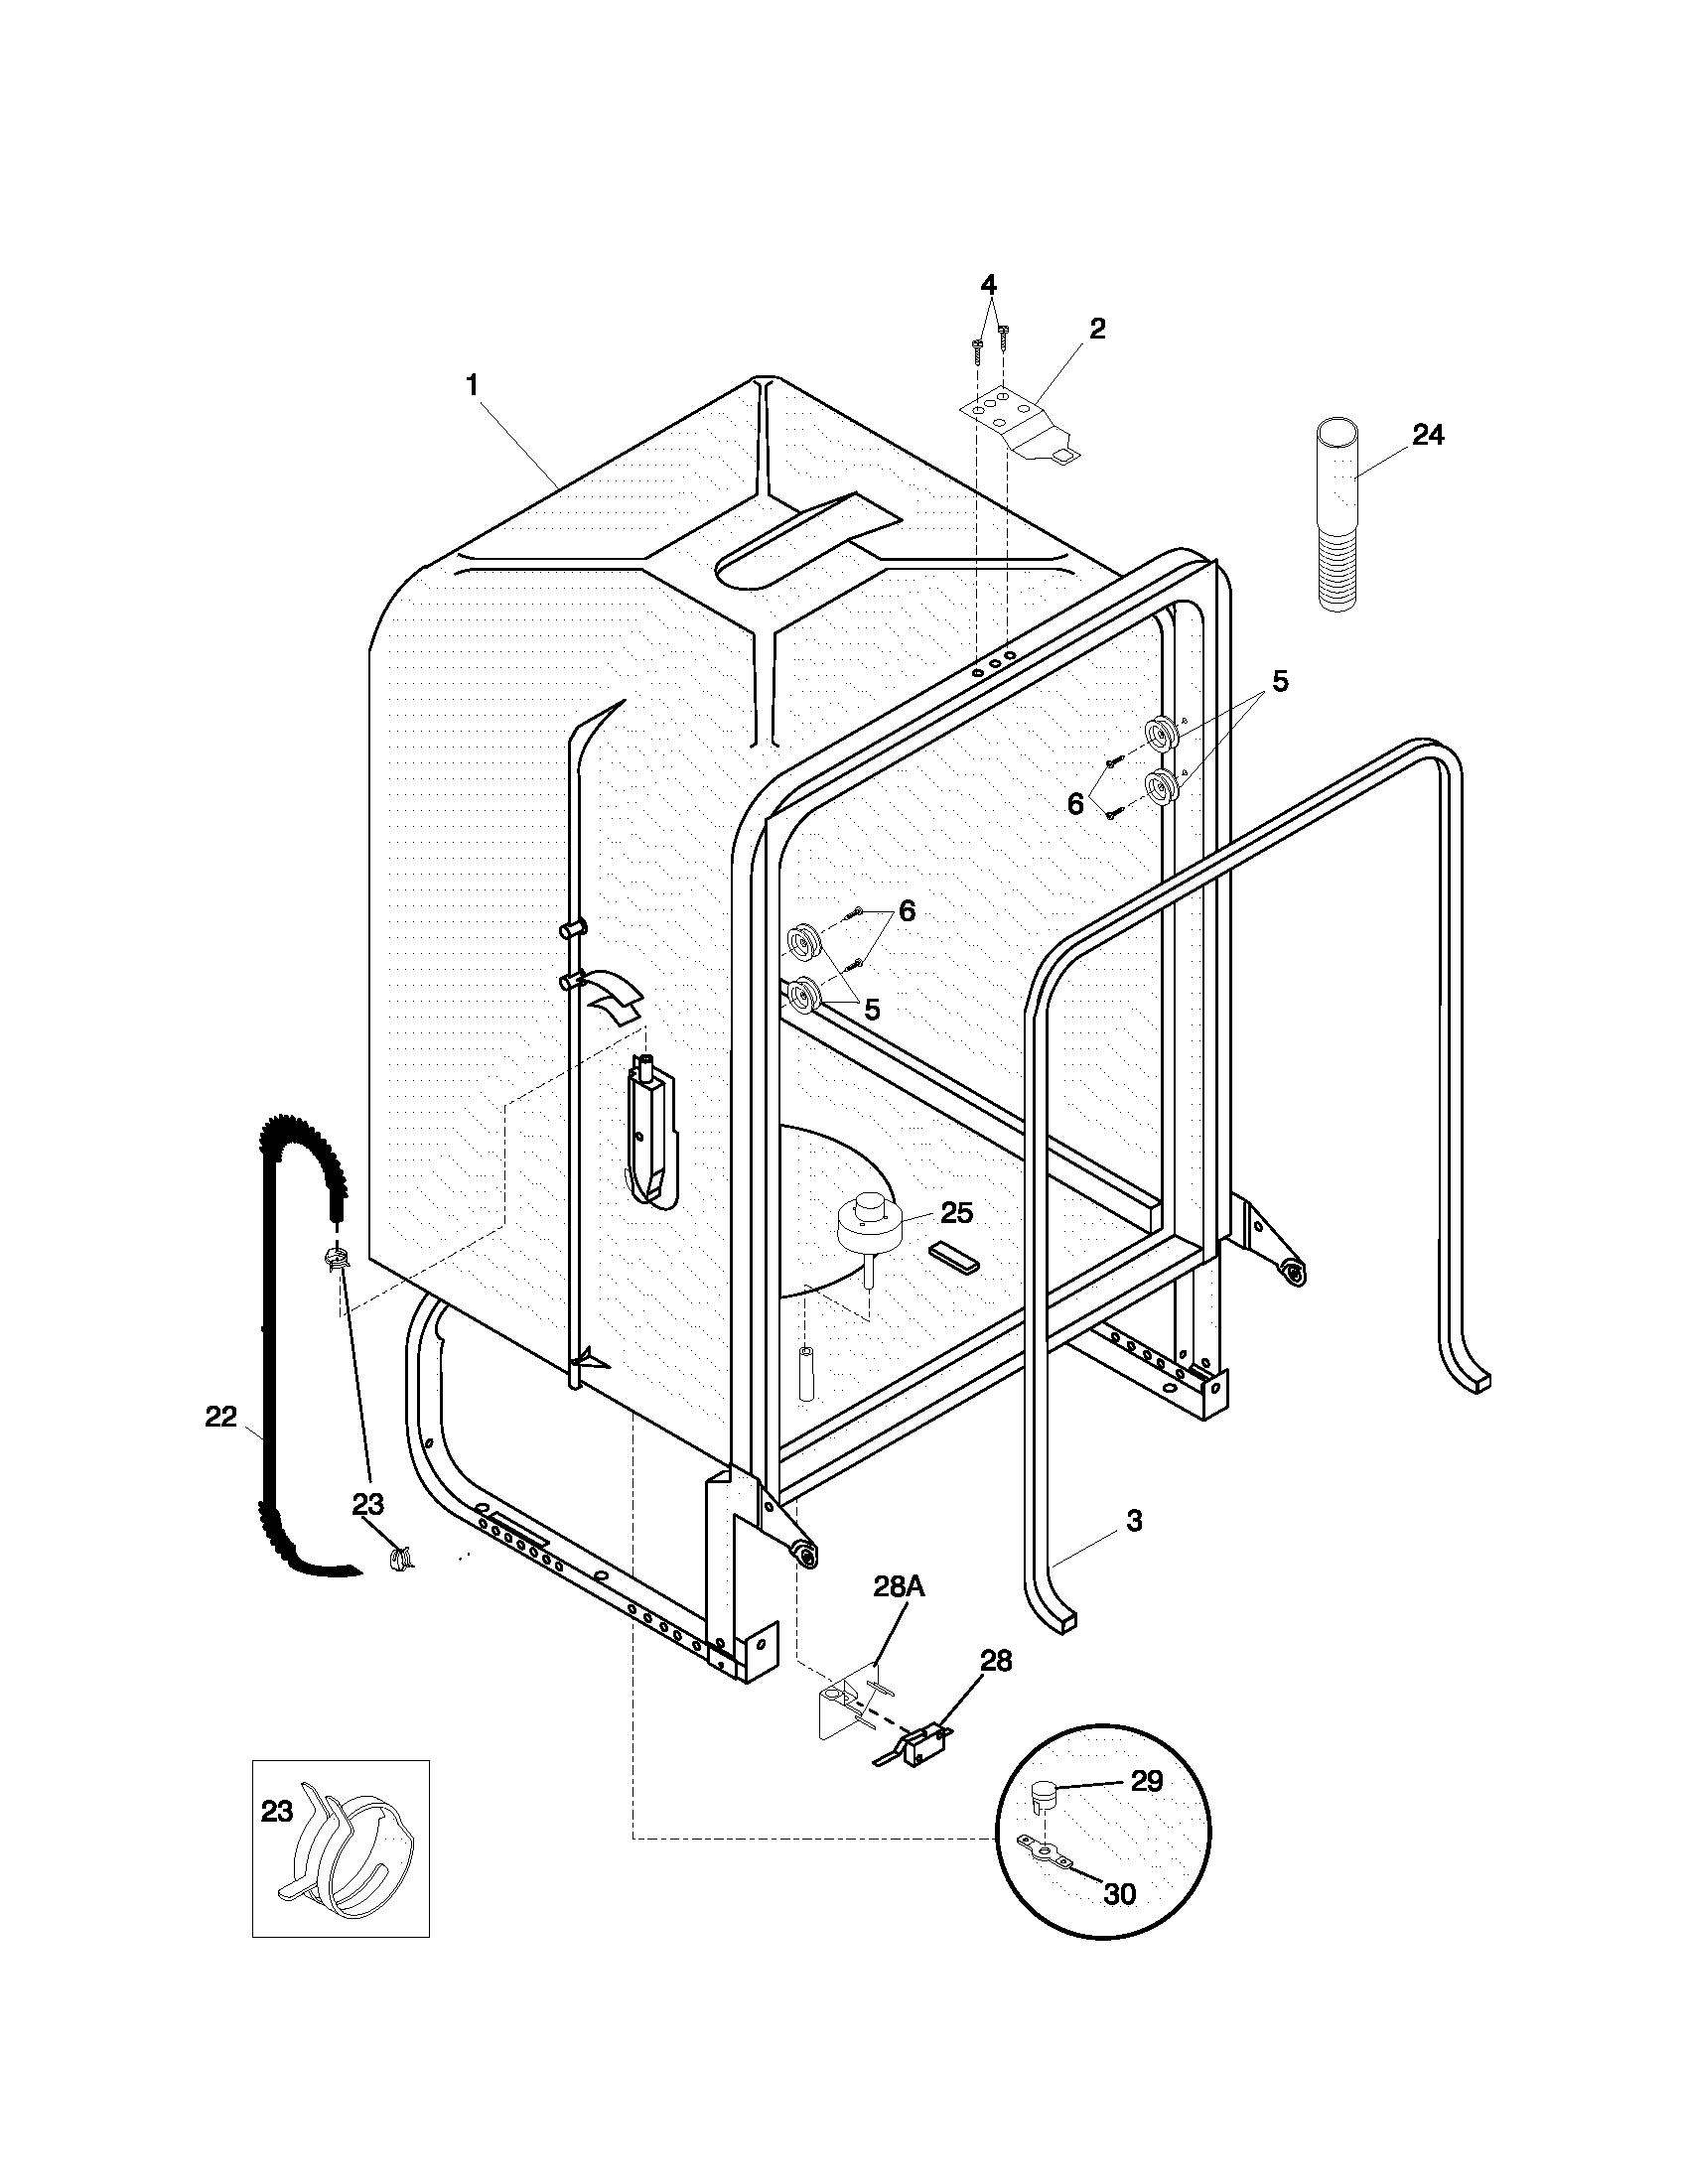 hight resolution of frigidaire gldb653js2 tub diagram